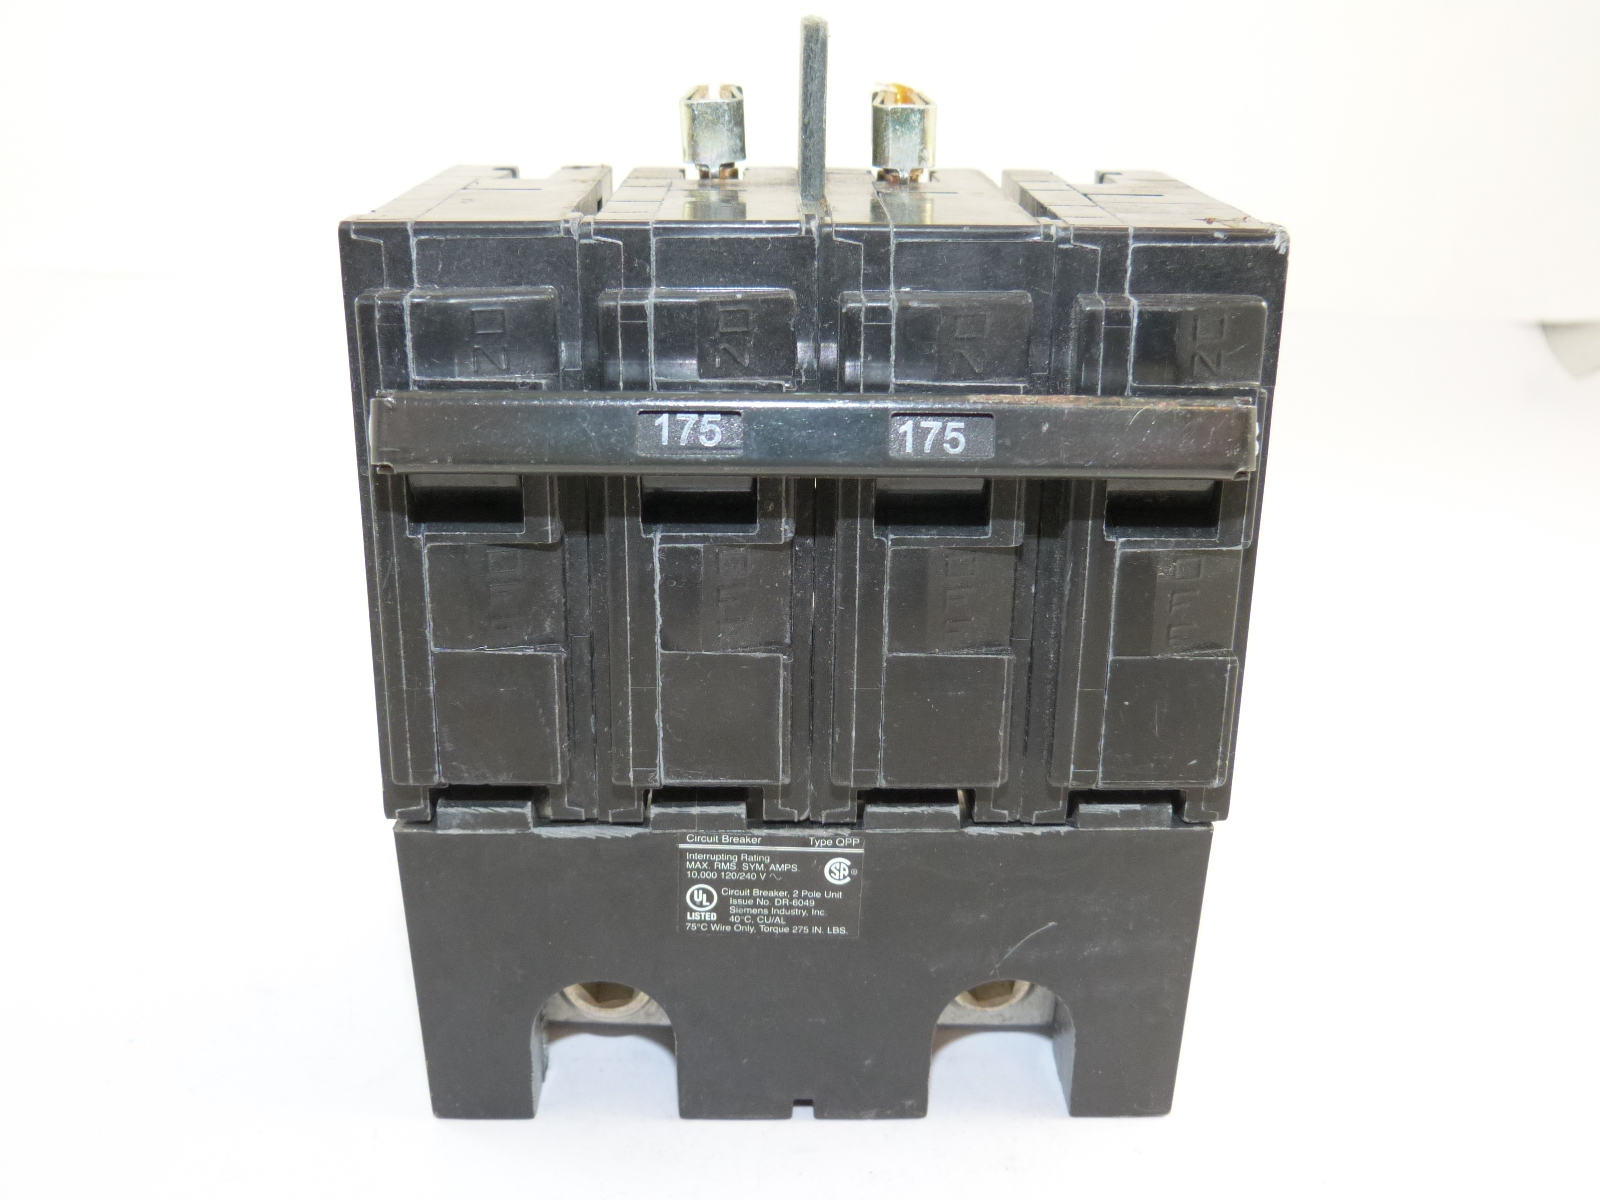 shunt trip breaker wiring diagram for hood goodman furnace get